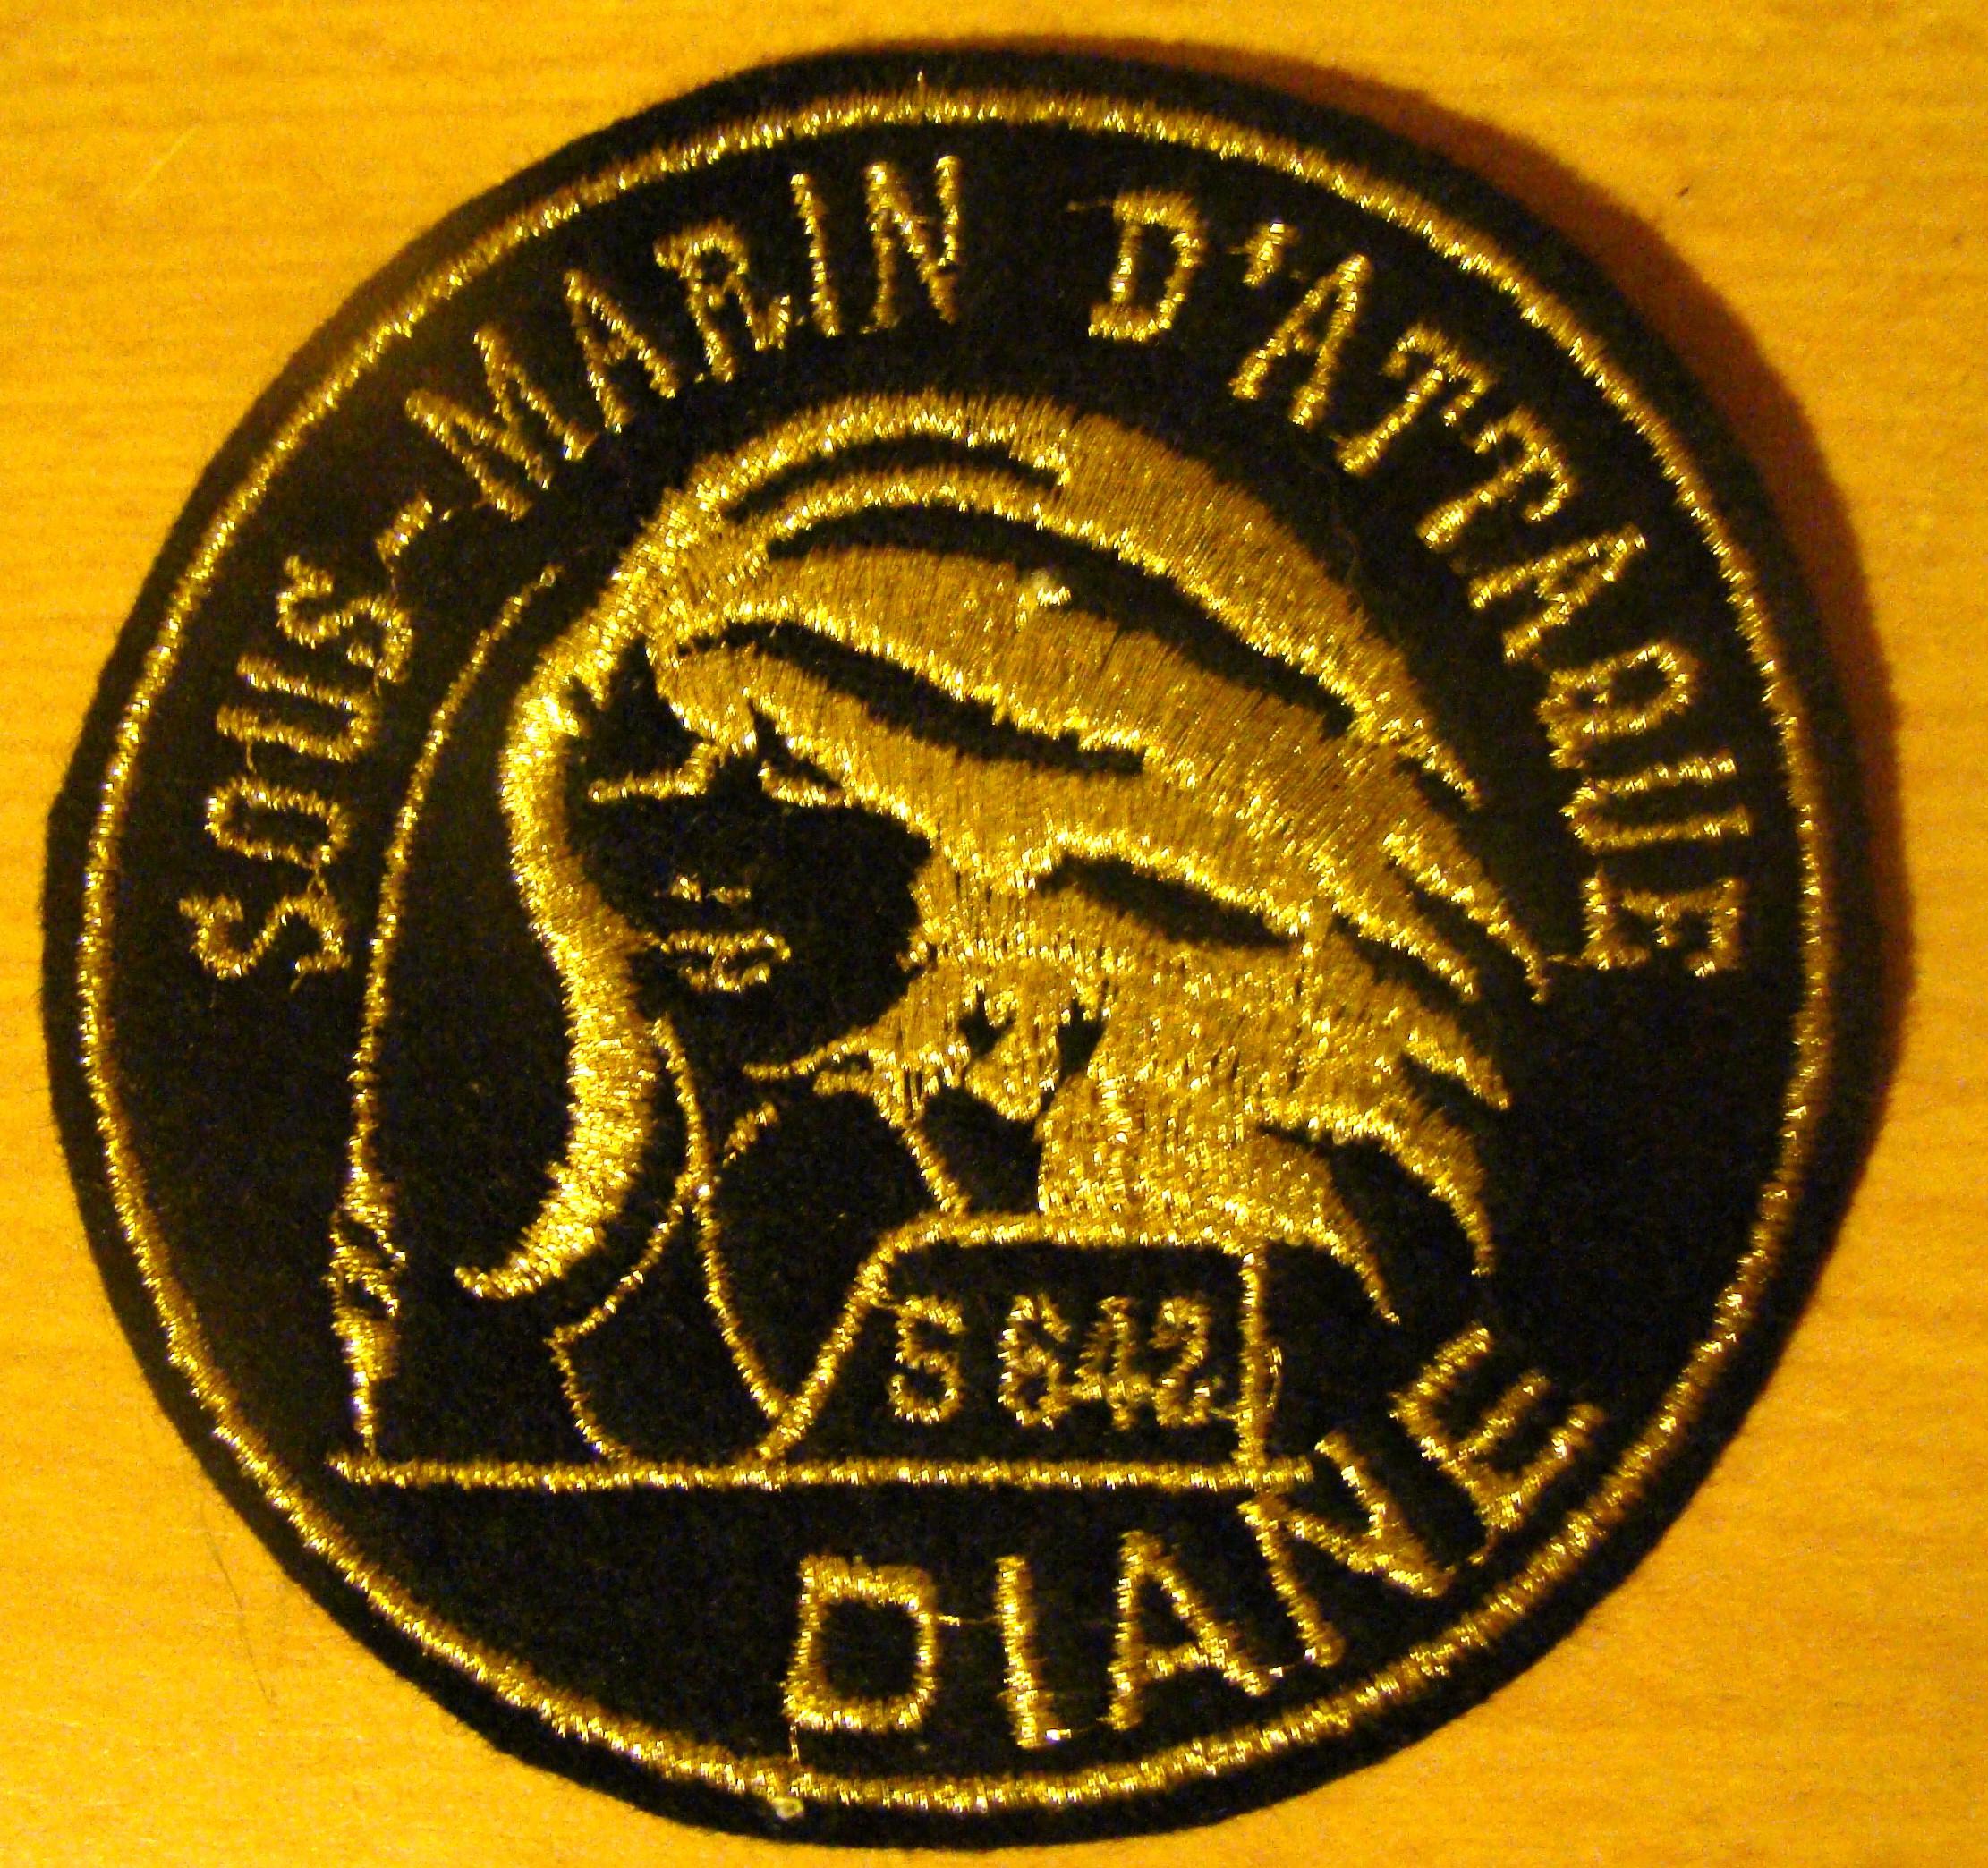 [Logos, Tapes, Insignes] Ecussons sous-marins - Page 2 442781DSC04370